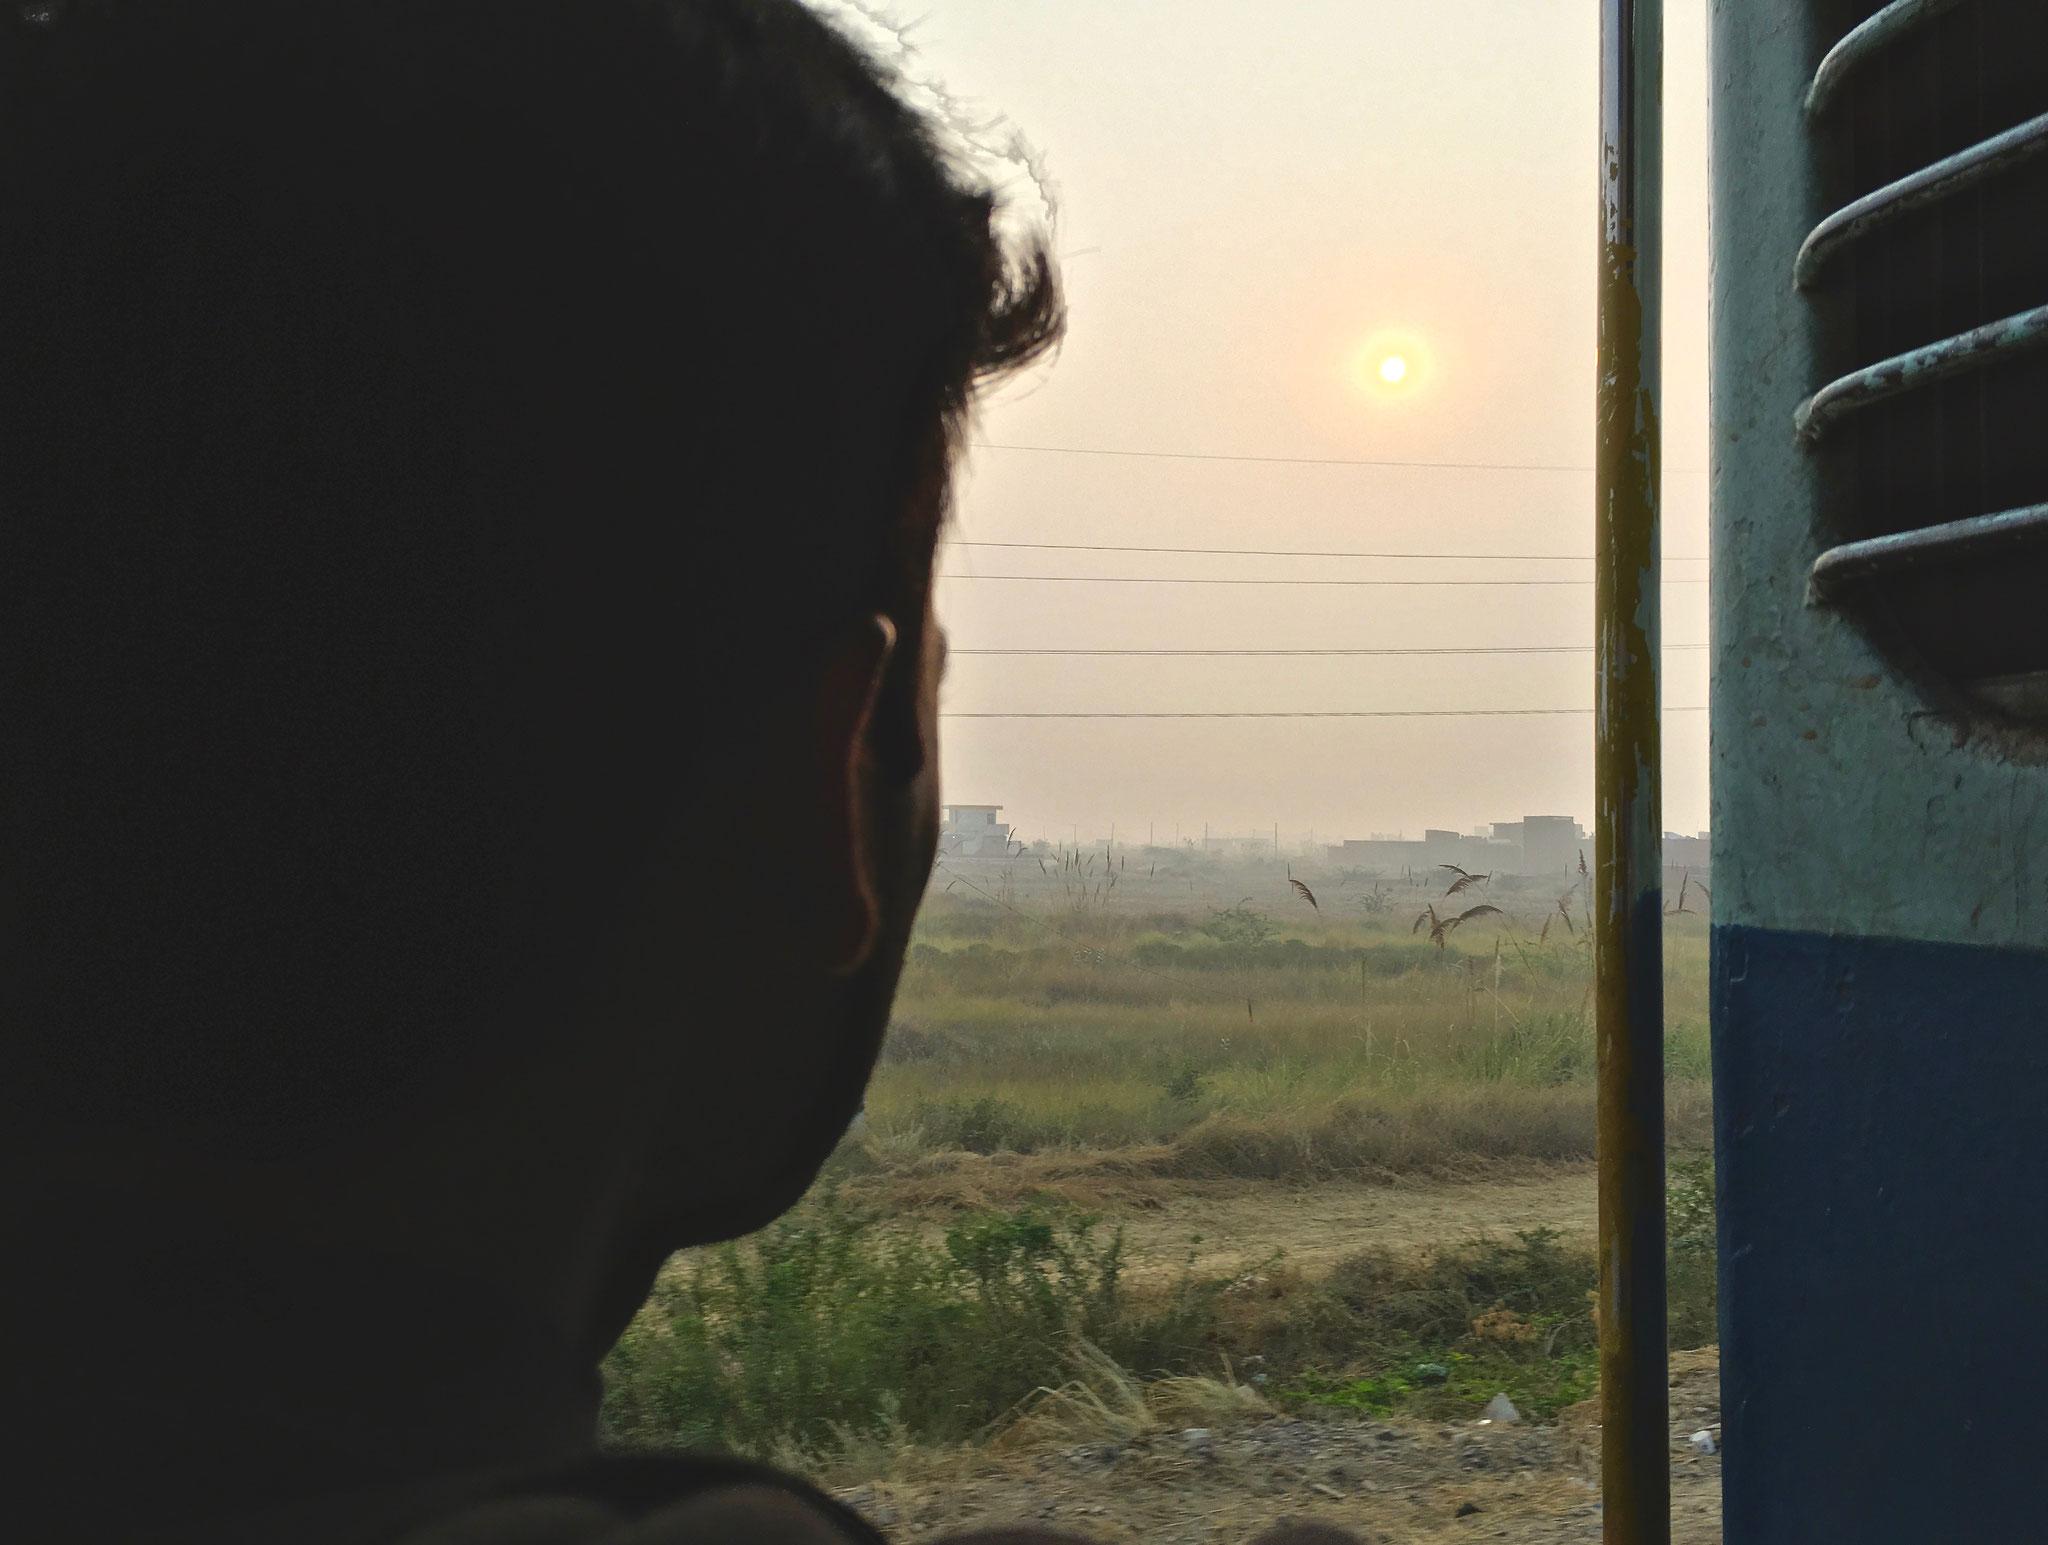 New Delhi, India 2015